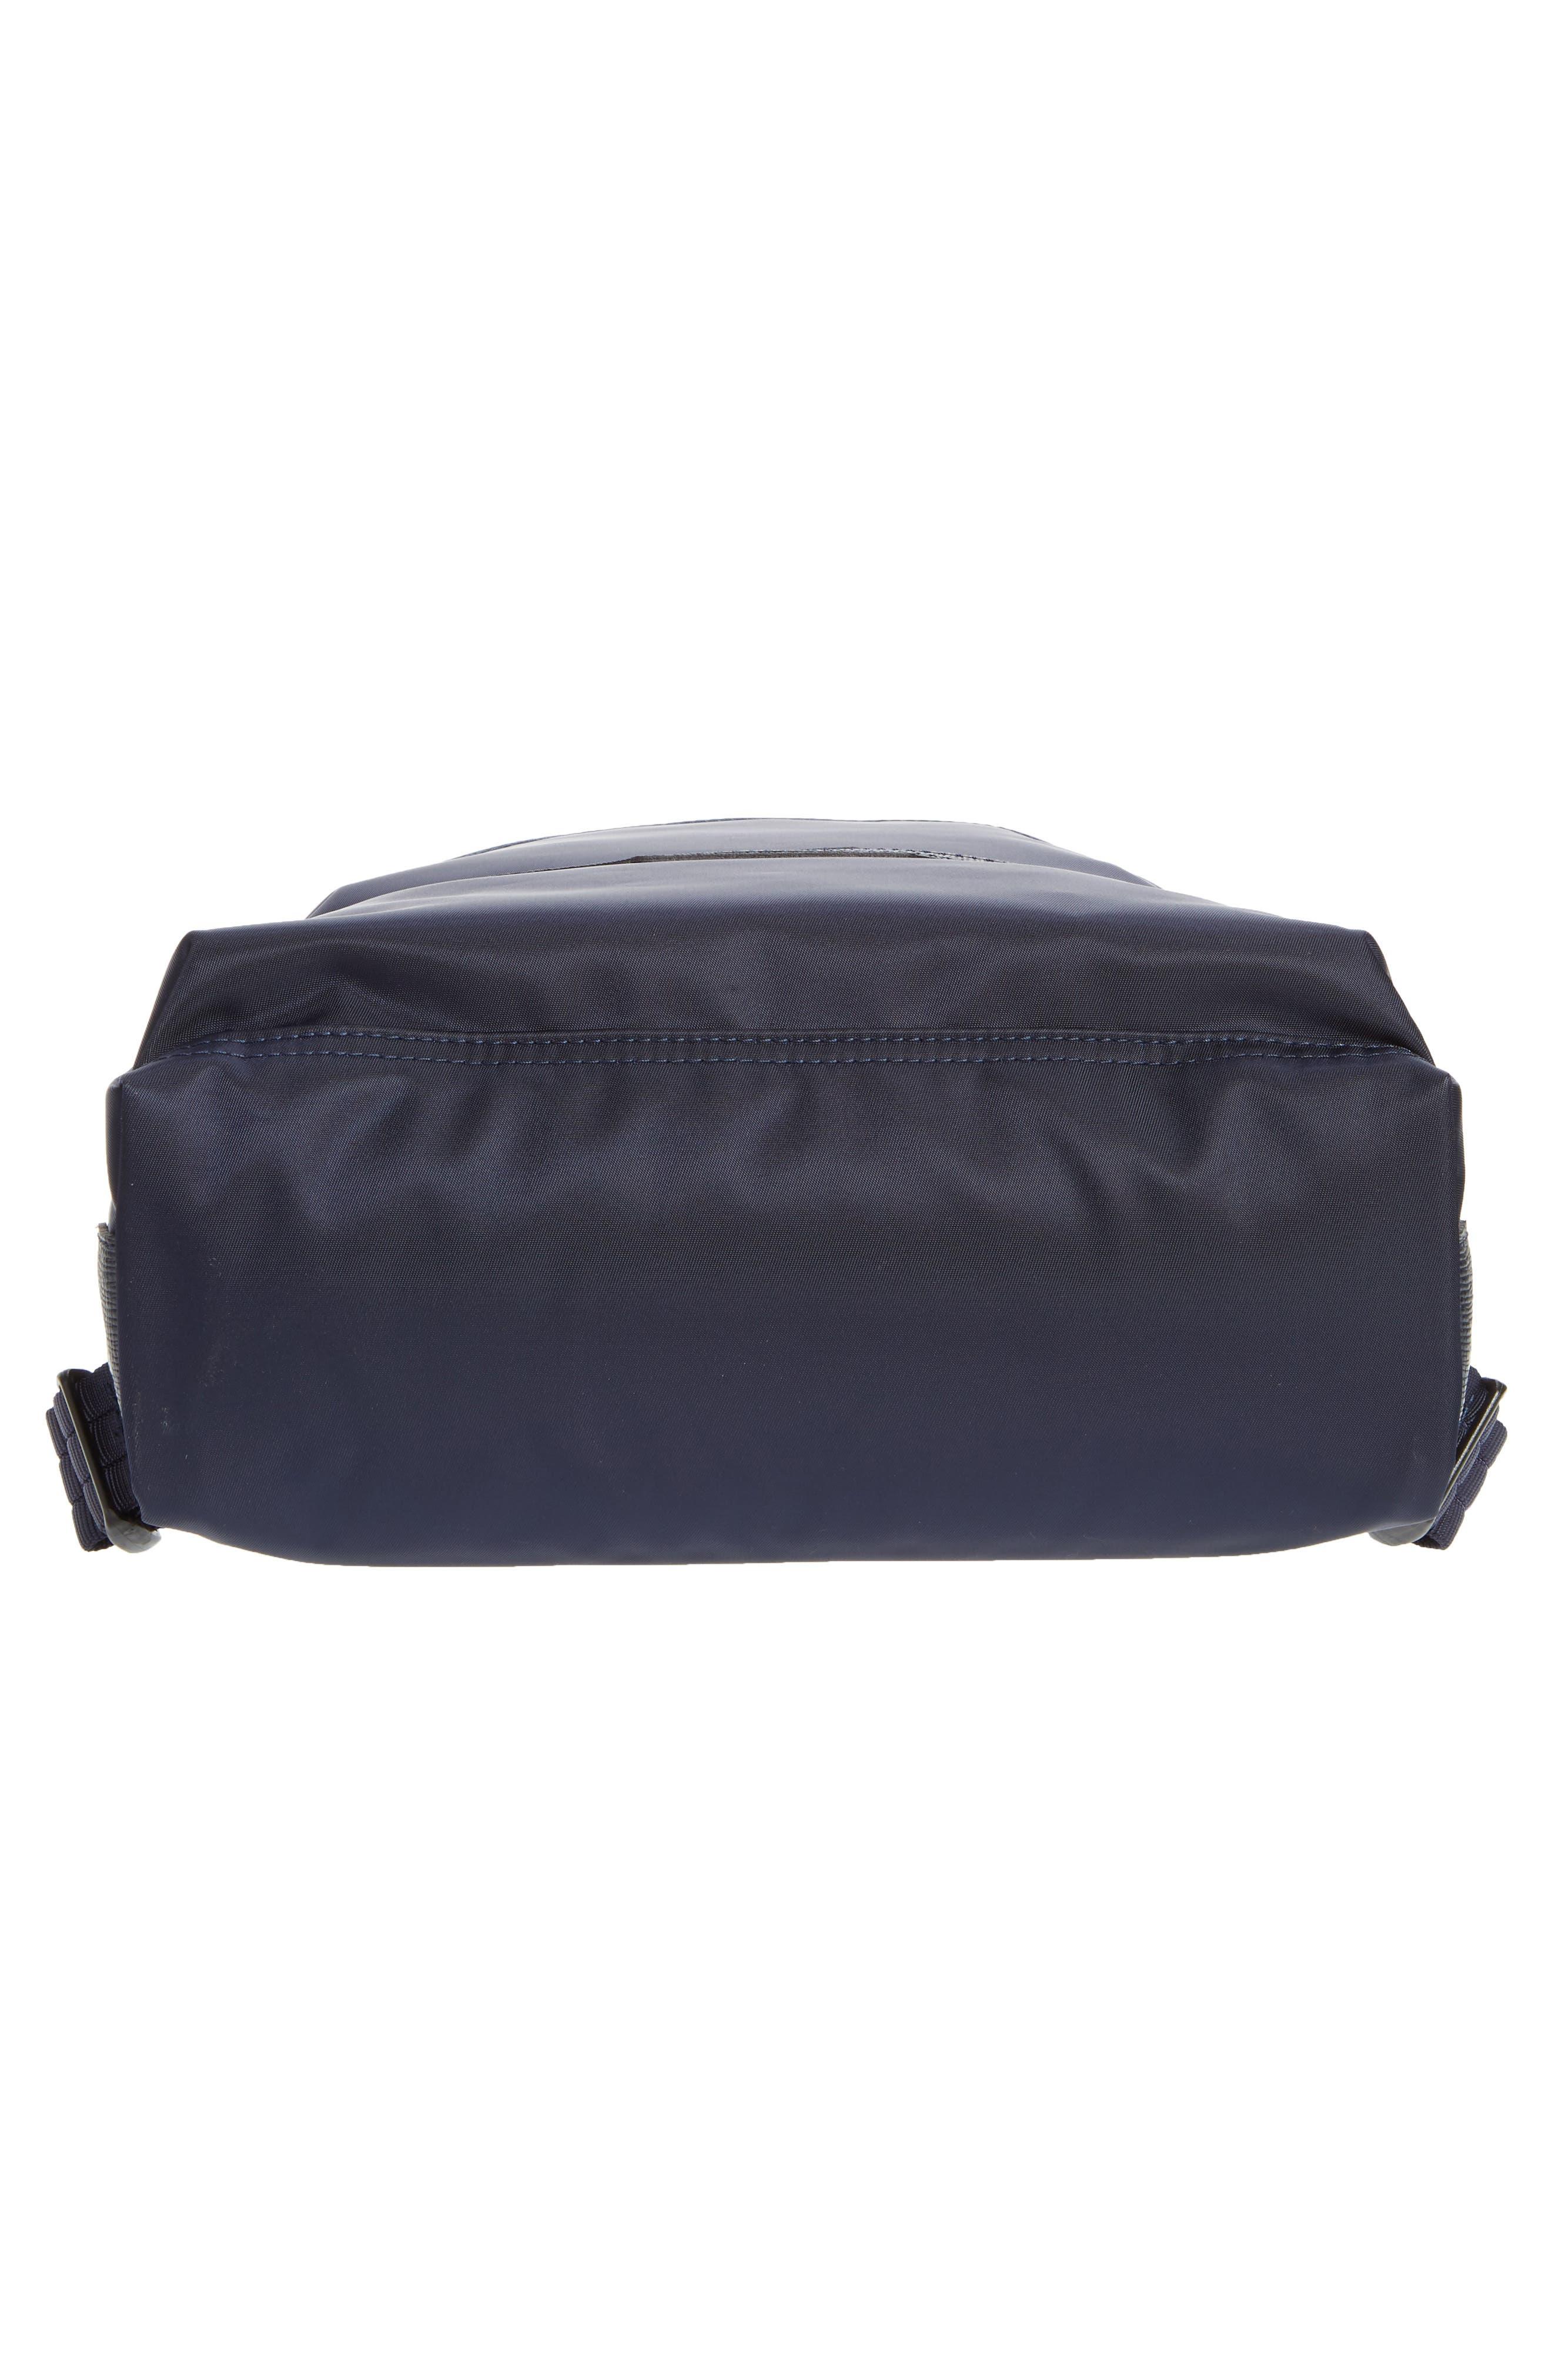 'Small Le Pliage Neo' Nylon Backpack,                             Alternate thumbnail 6, color,                             NAVY BLUE